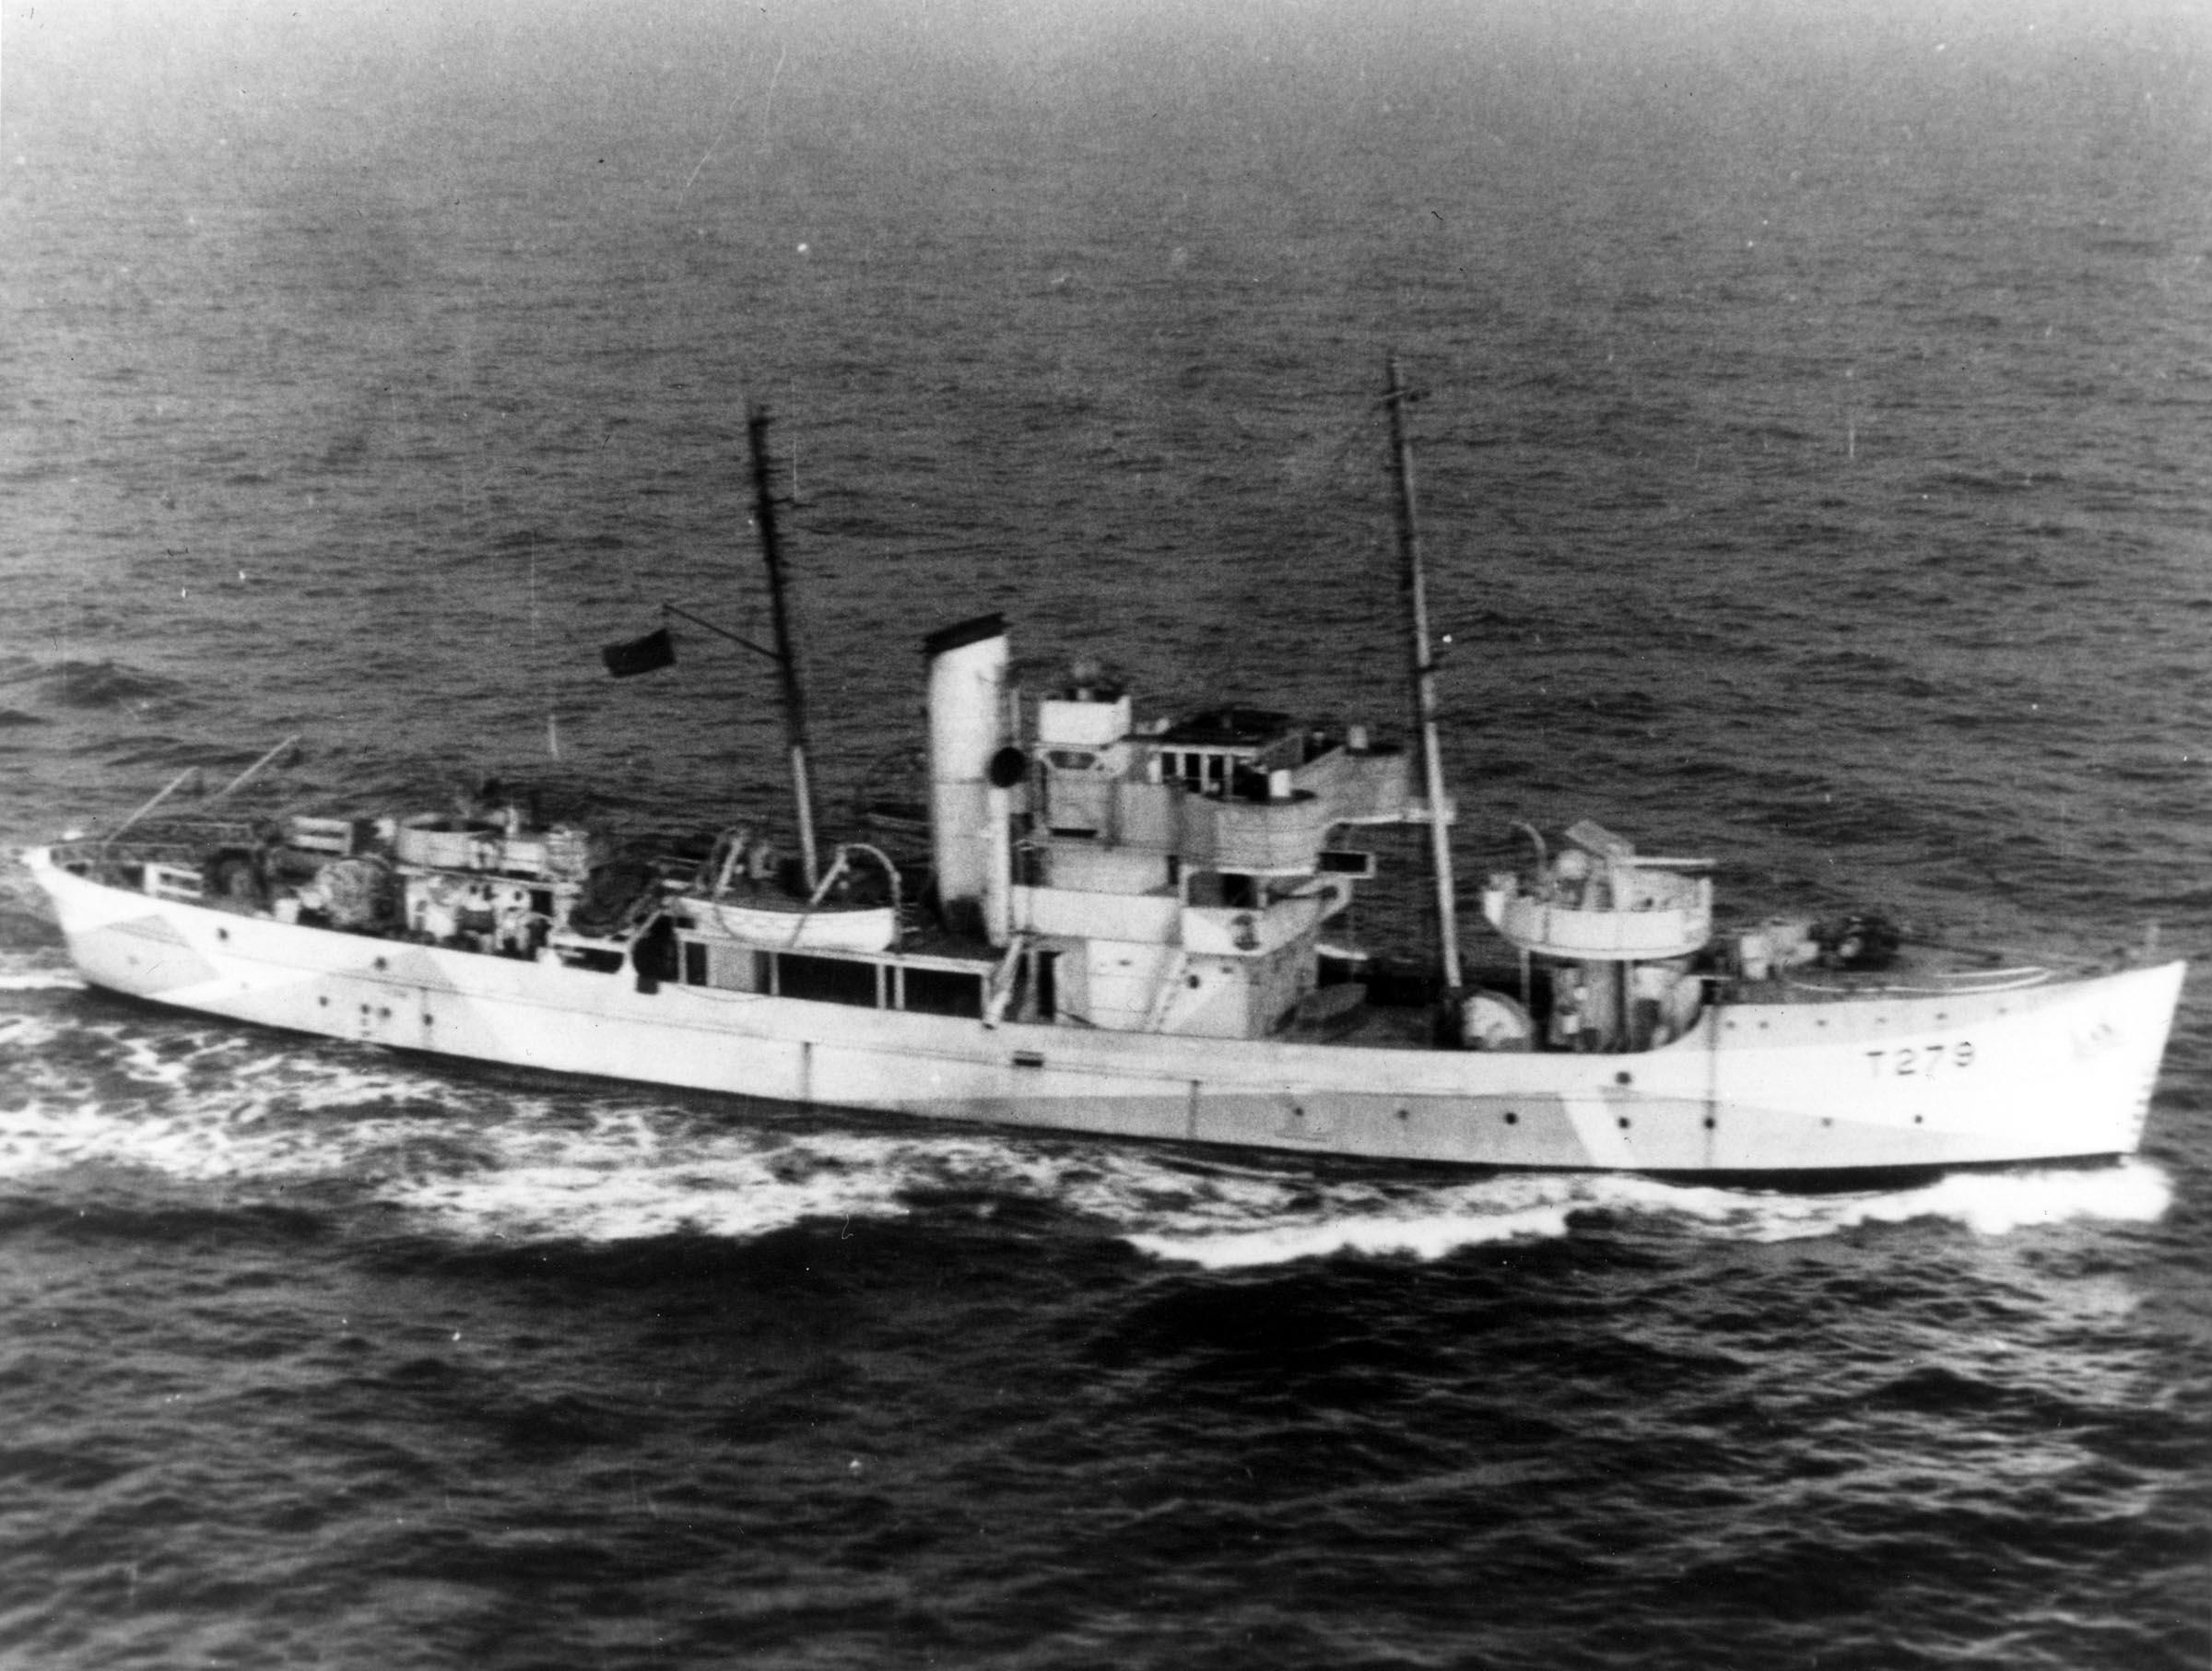 HMCS MAGDALEN